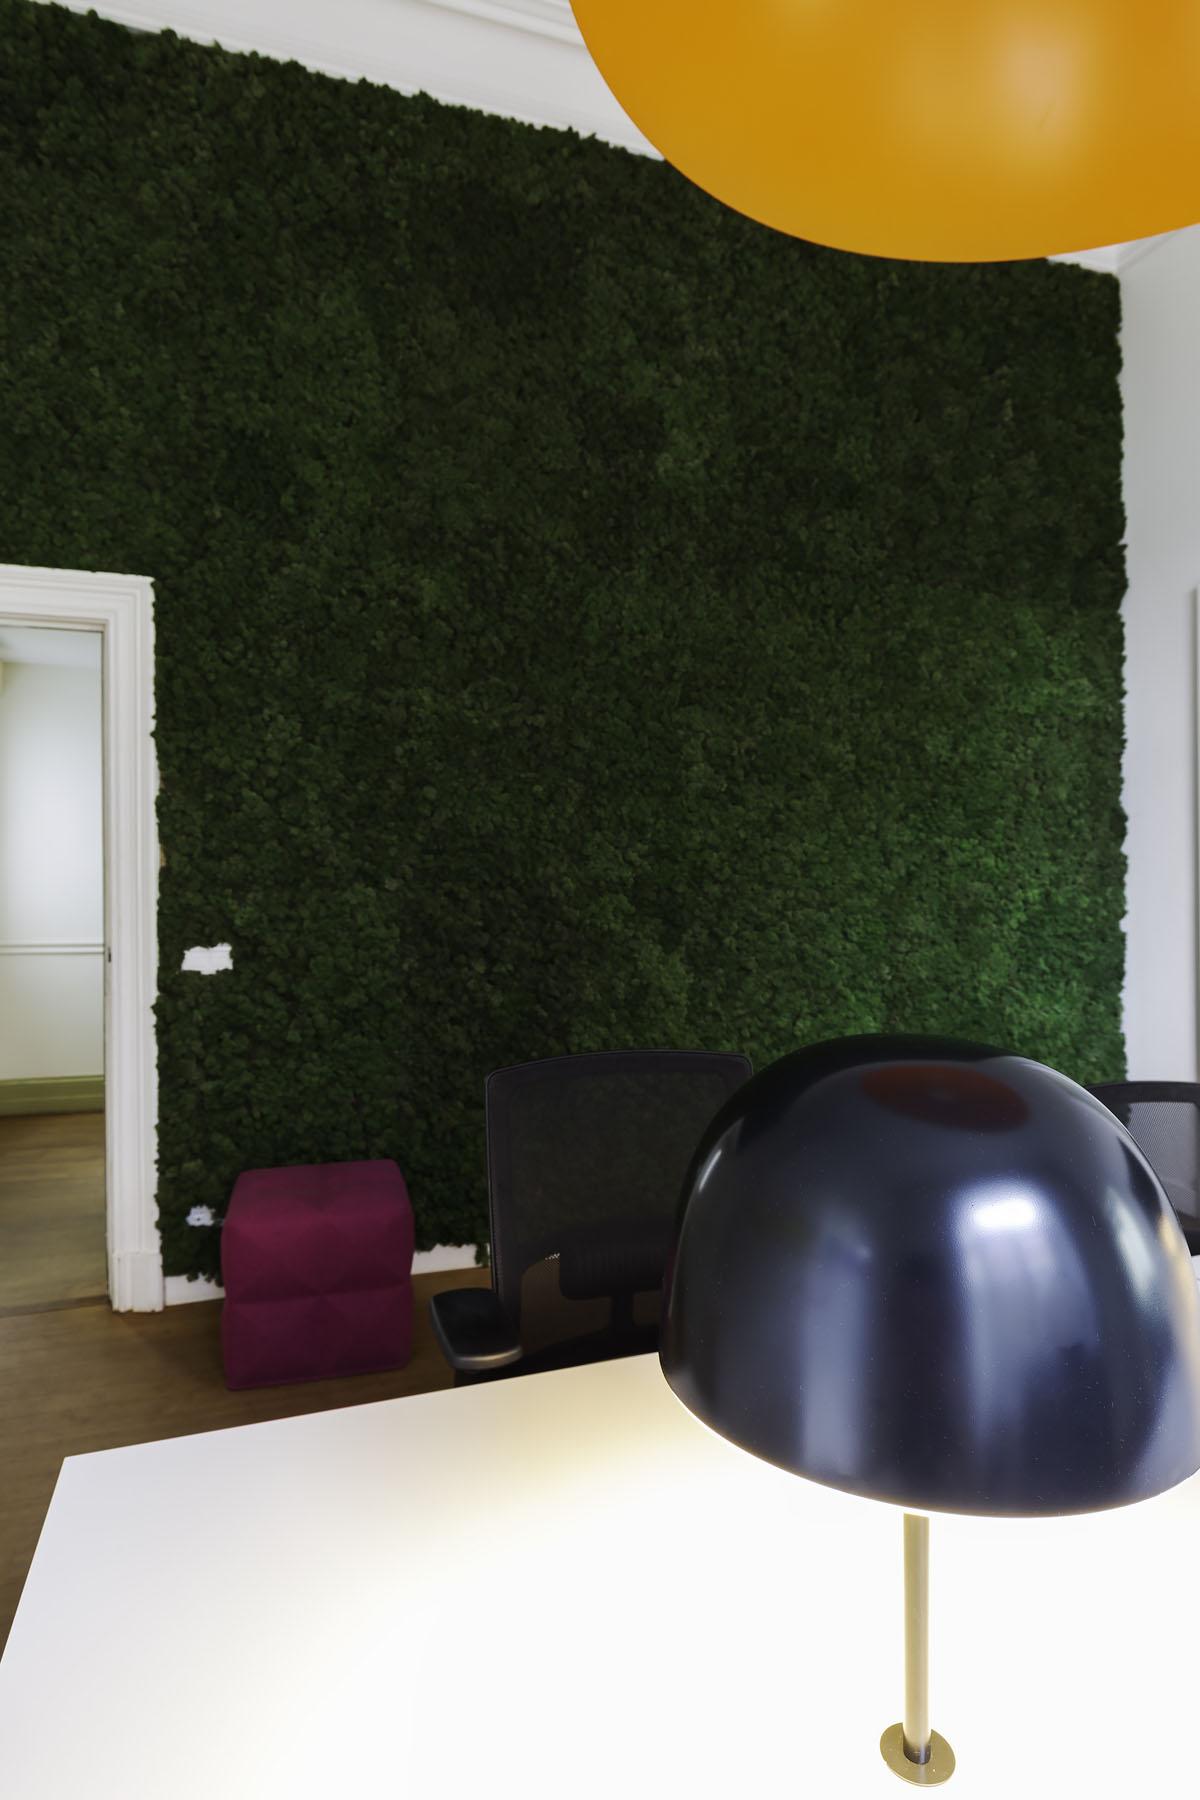 Freedom-Lab-Amsterdam-Jeroen-Machielsen-9.jpg